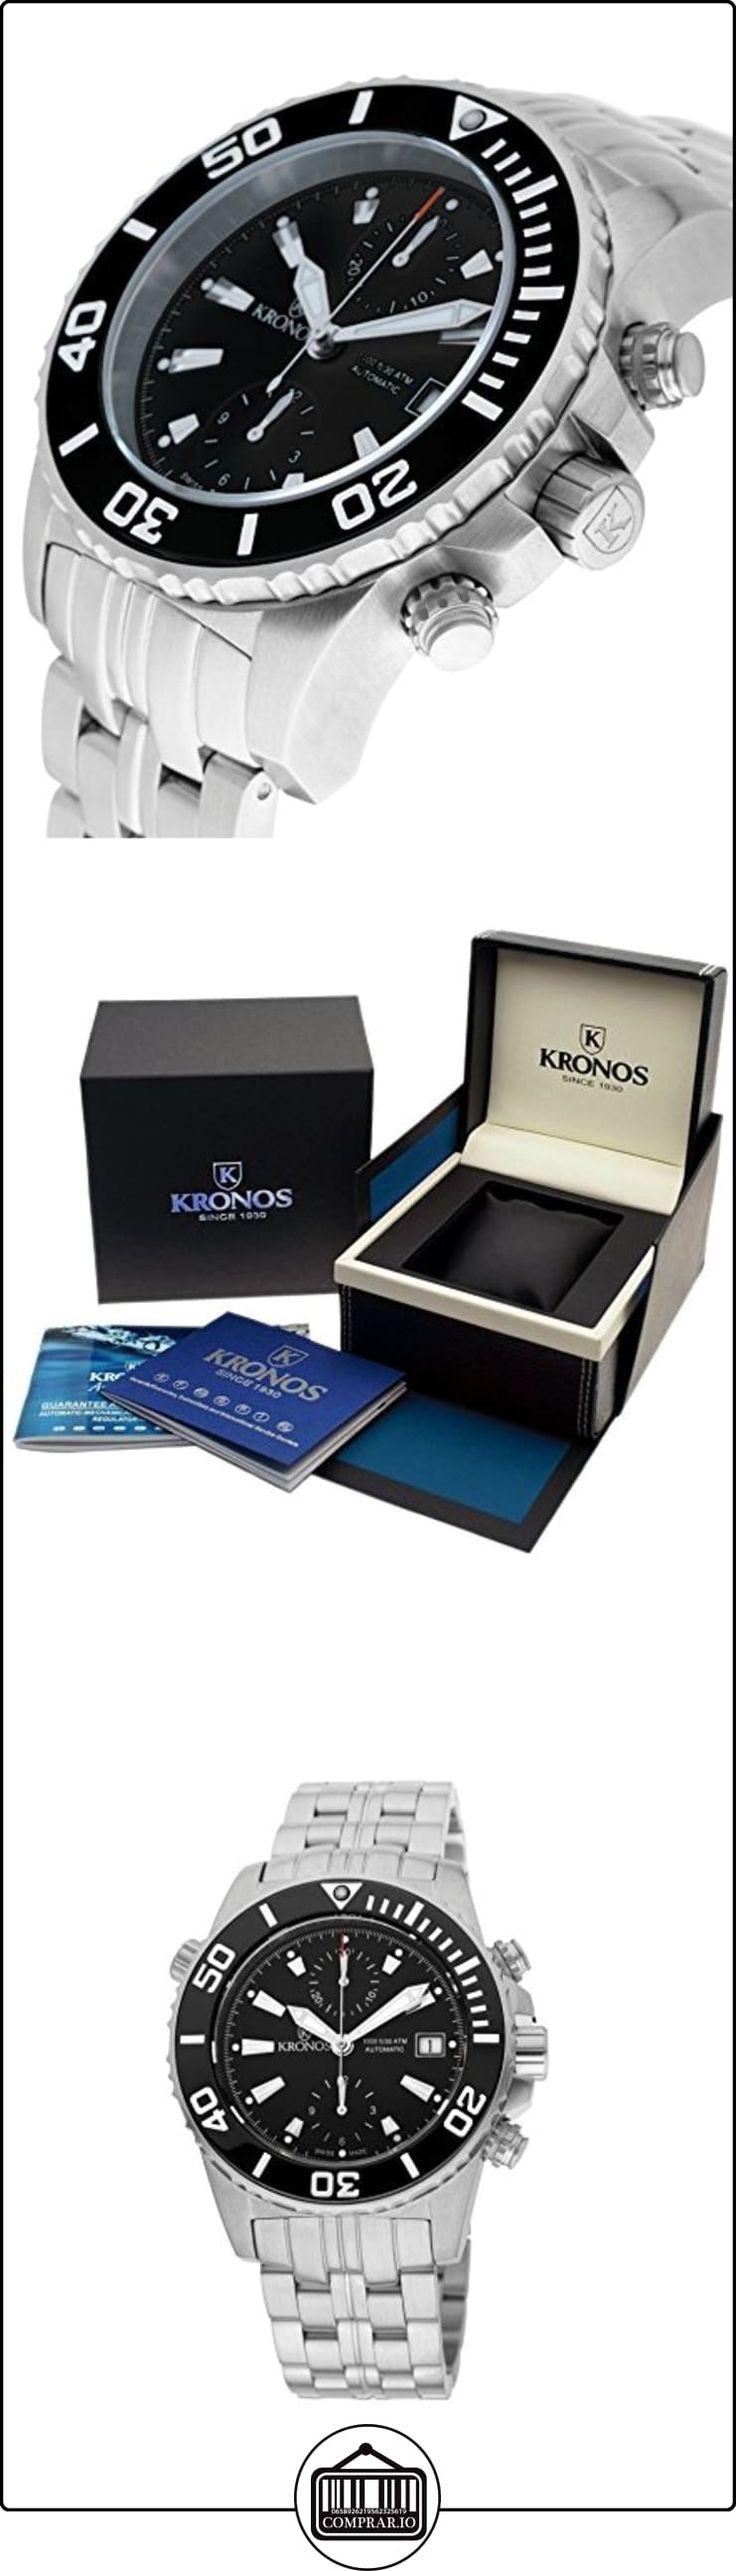 Kronos - K300 Automatic Ceramic Black 736N2.855 CHR - Reloj de caballero automático, brazalete de acero, color esfera: negra  ✿ Relojes para hombre - (Lujo) ✿